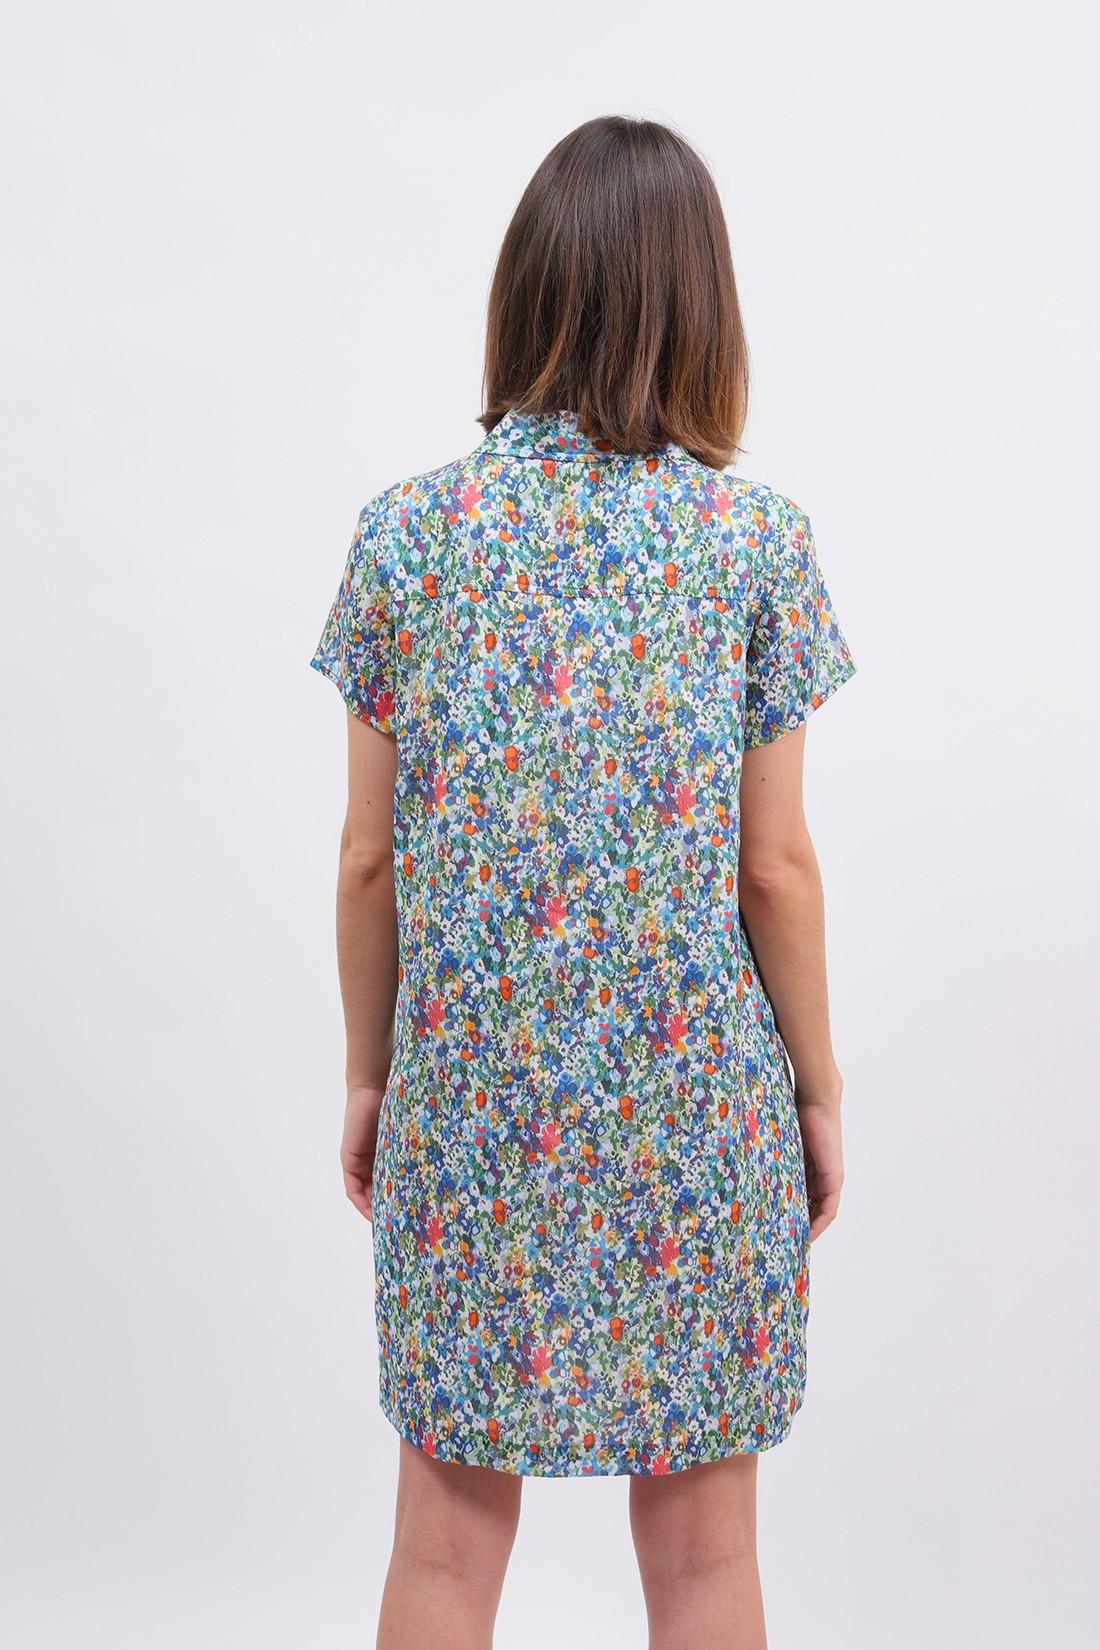 A.P.C. FOR WOMAN / Robe prudence Multicolore